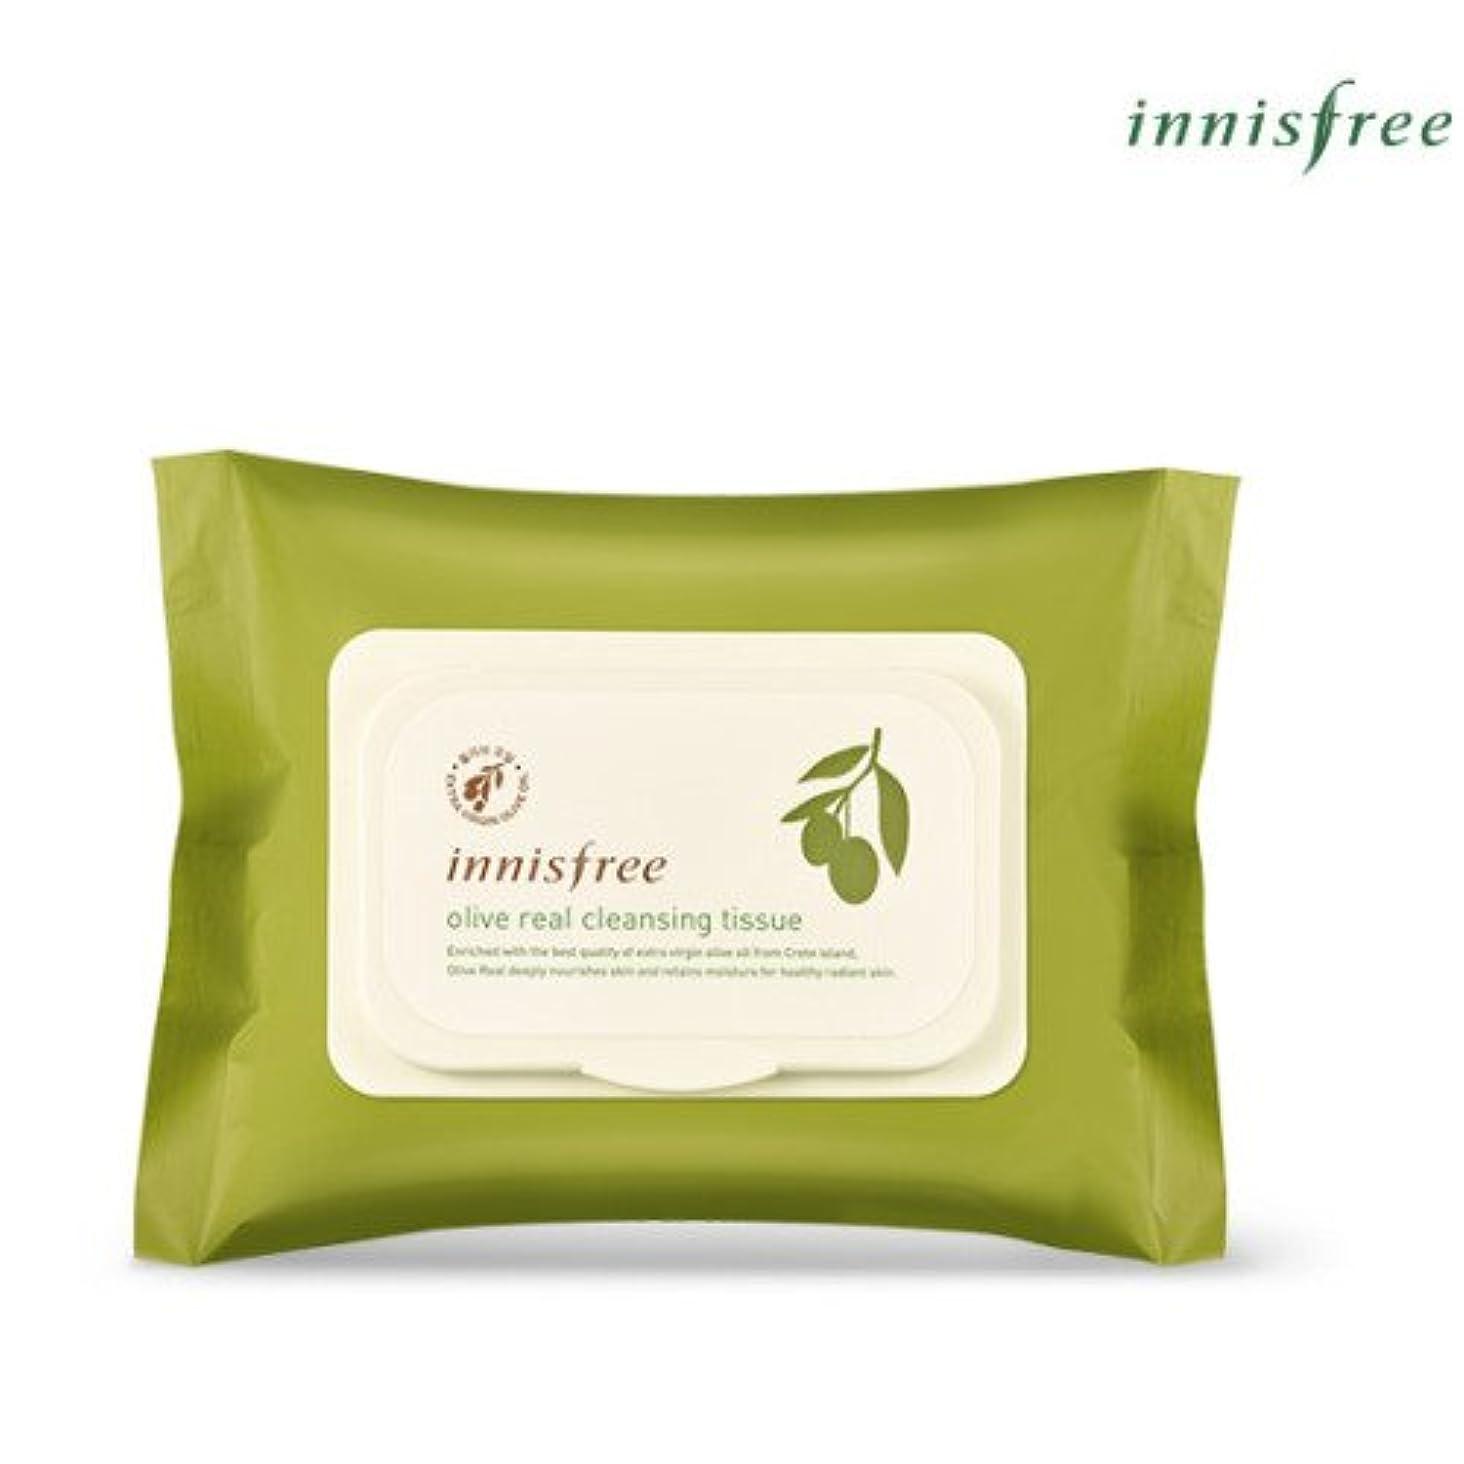 [INNISFREE]イニスフリーオリーブリアルクレンジングティッシュ30個入olive real cleansing tissue 30pcs [並行輸入品]